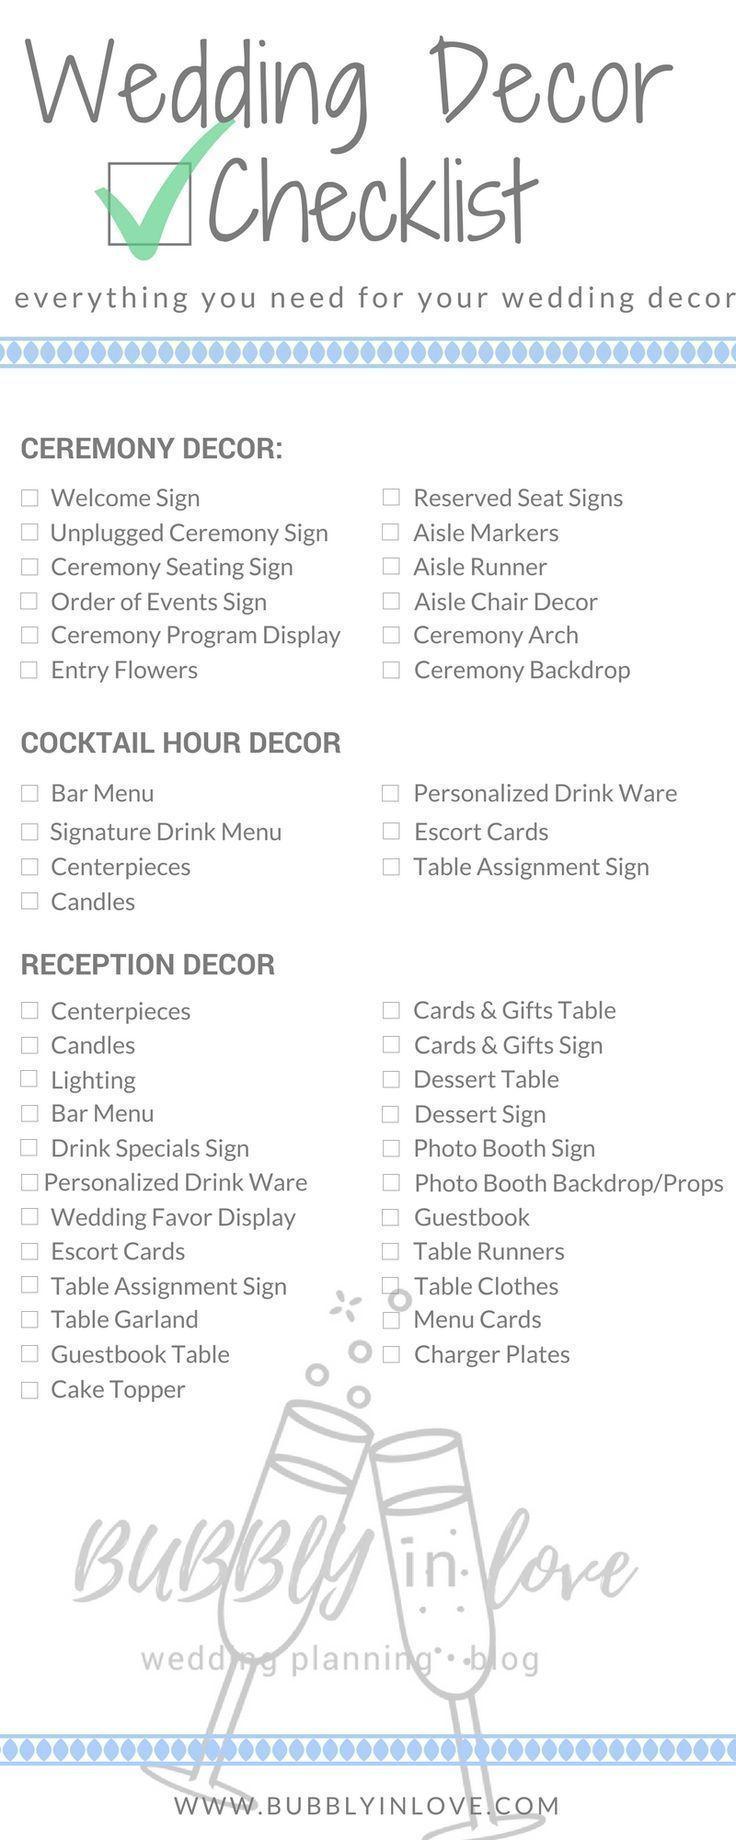 Wedding decorations checklist  Wedding Decor Checklist  Wedding Decor  Ceremony Decor  Reception